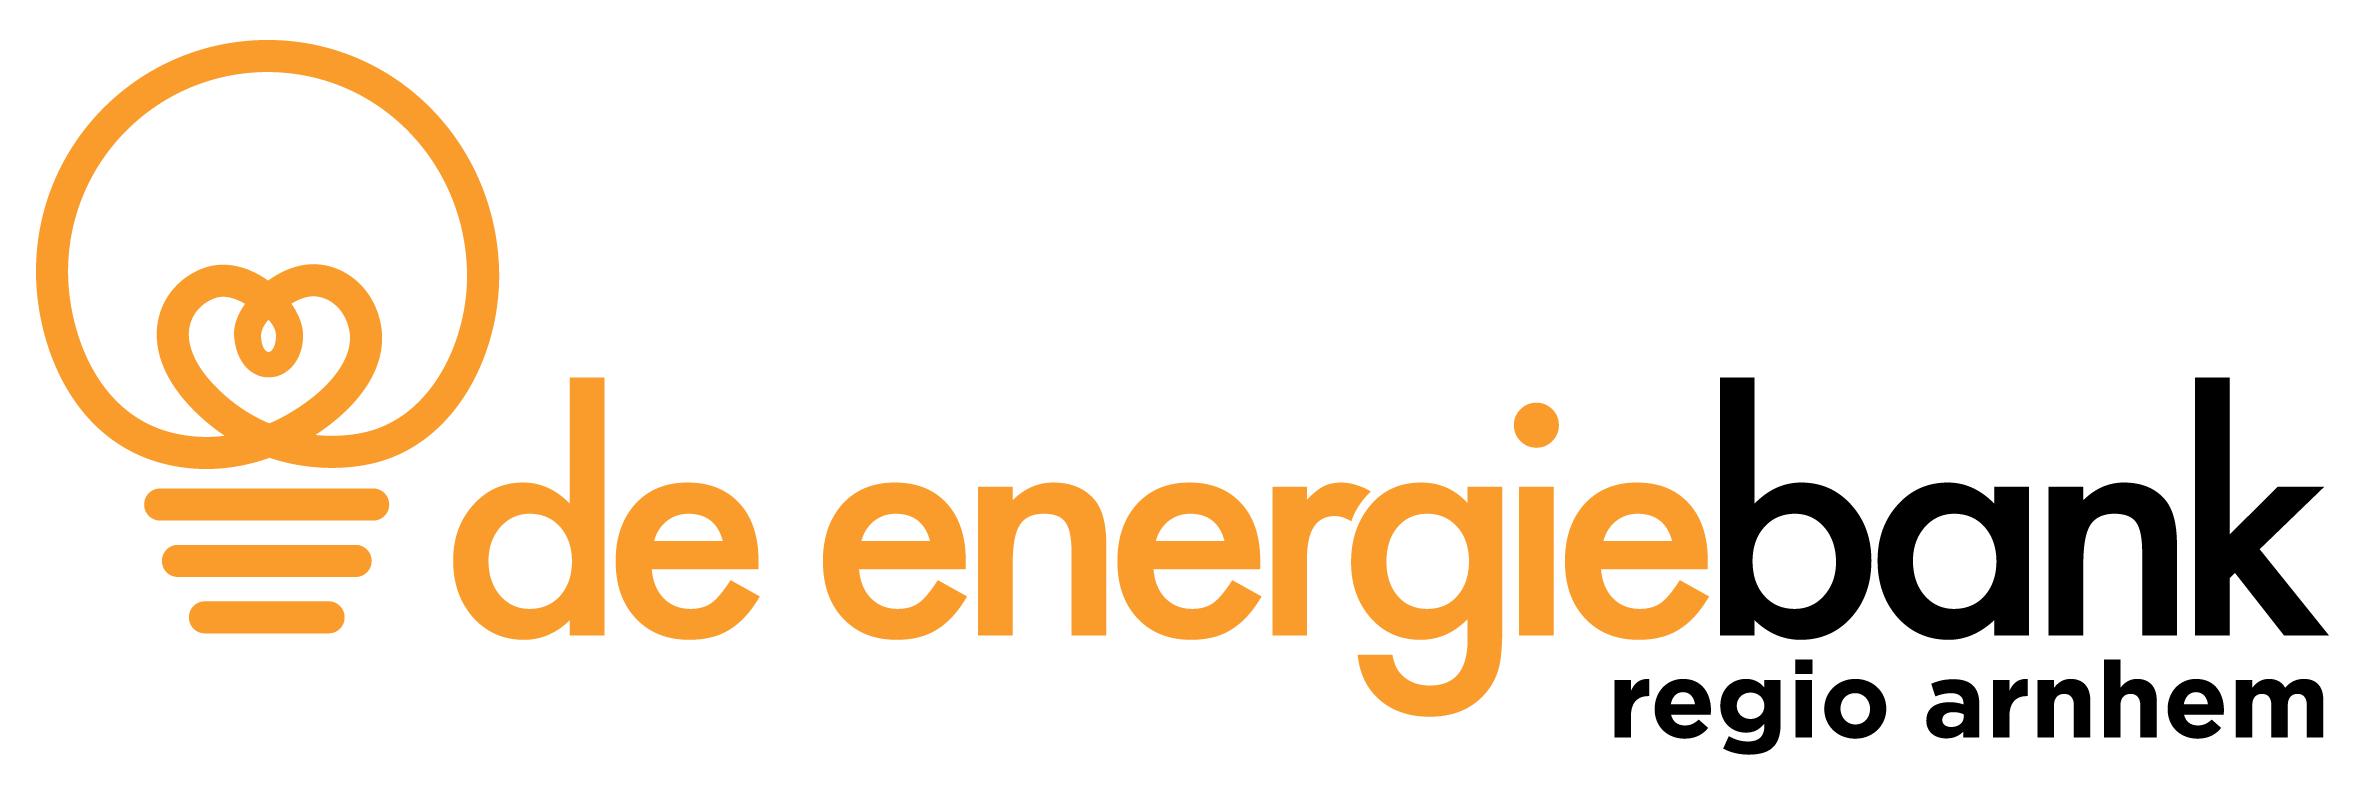 Energiebank Regio Arnhem